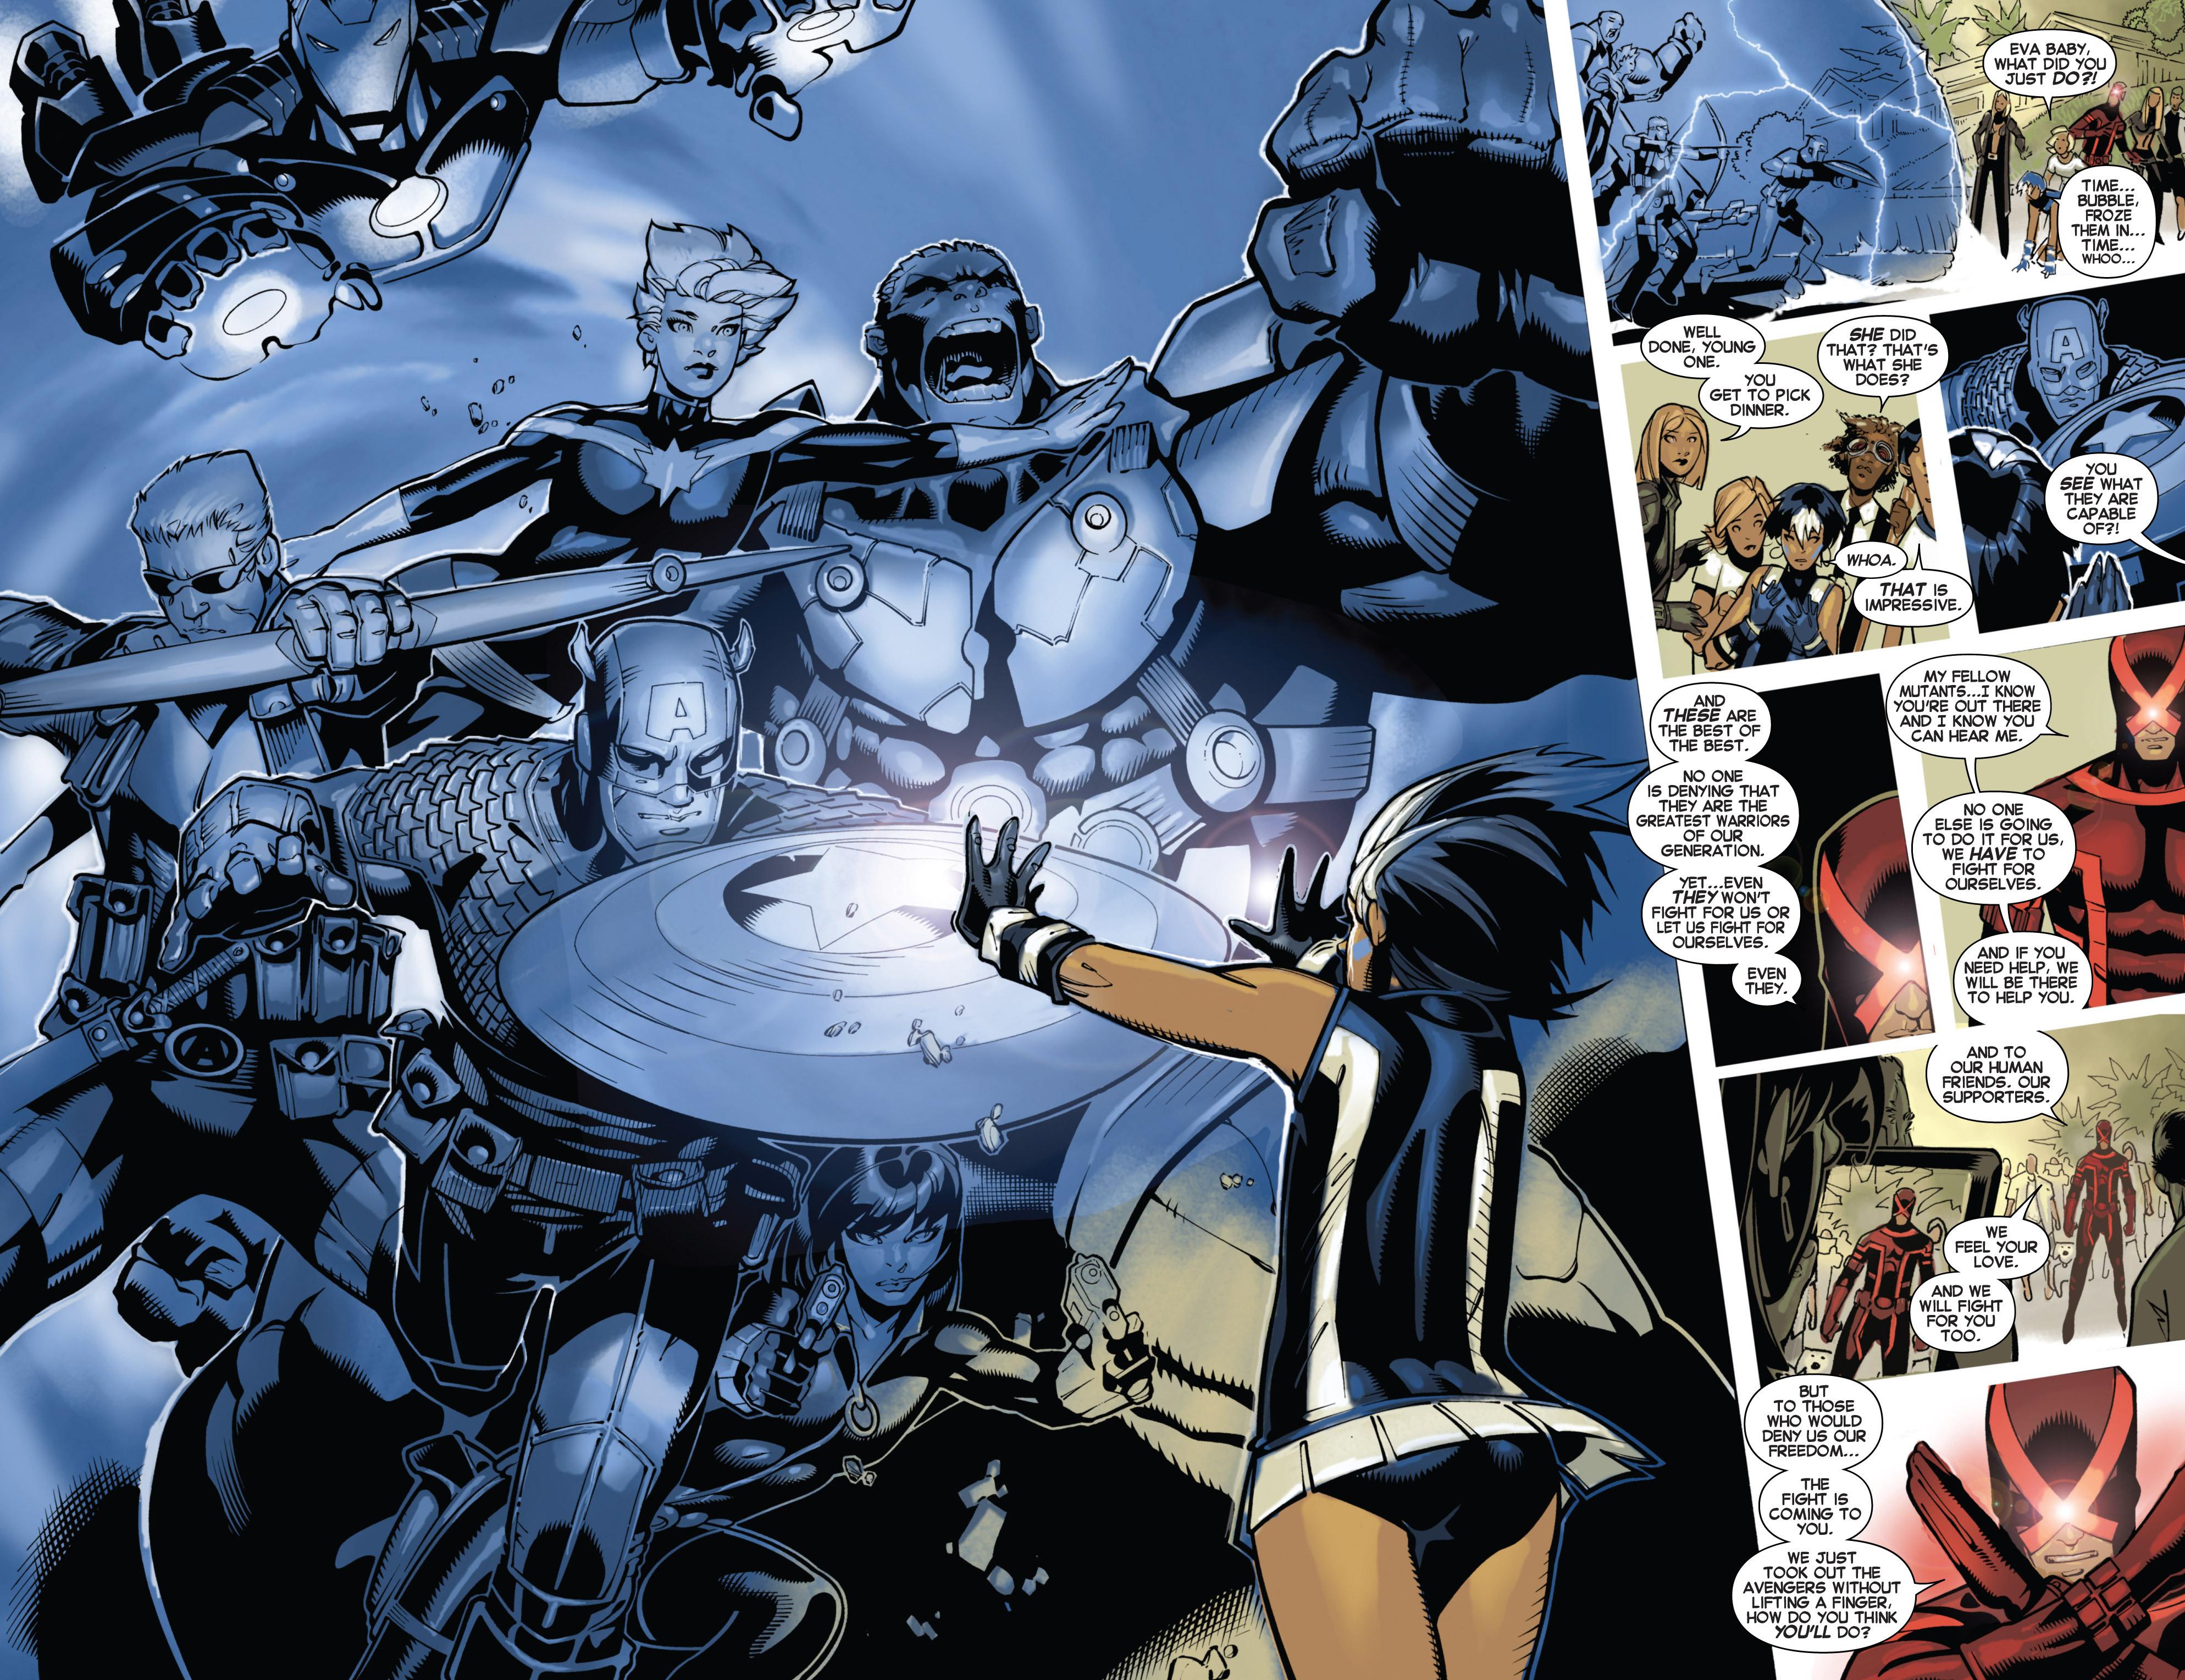 Read online Uncanny X-Men (2013) comic -  Issue # _TPB 1 - Revolution - 56